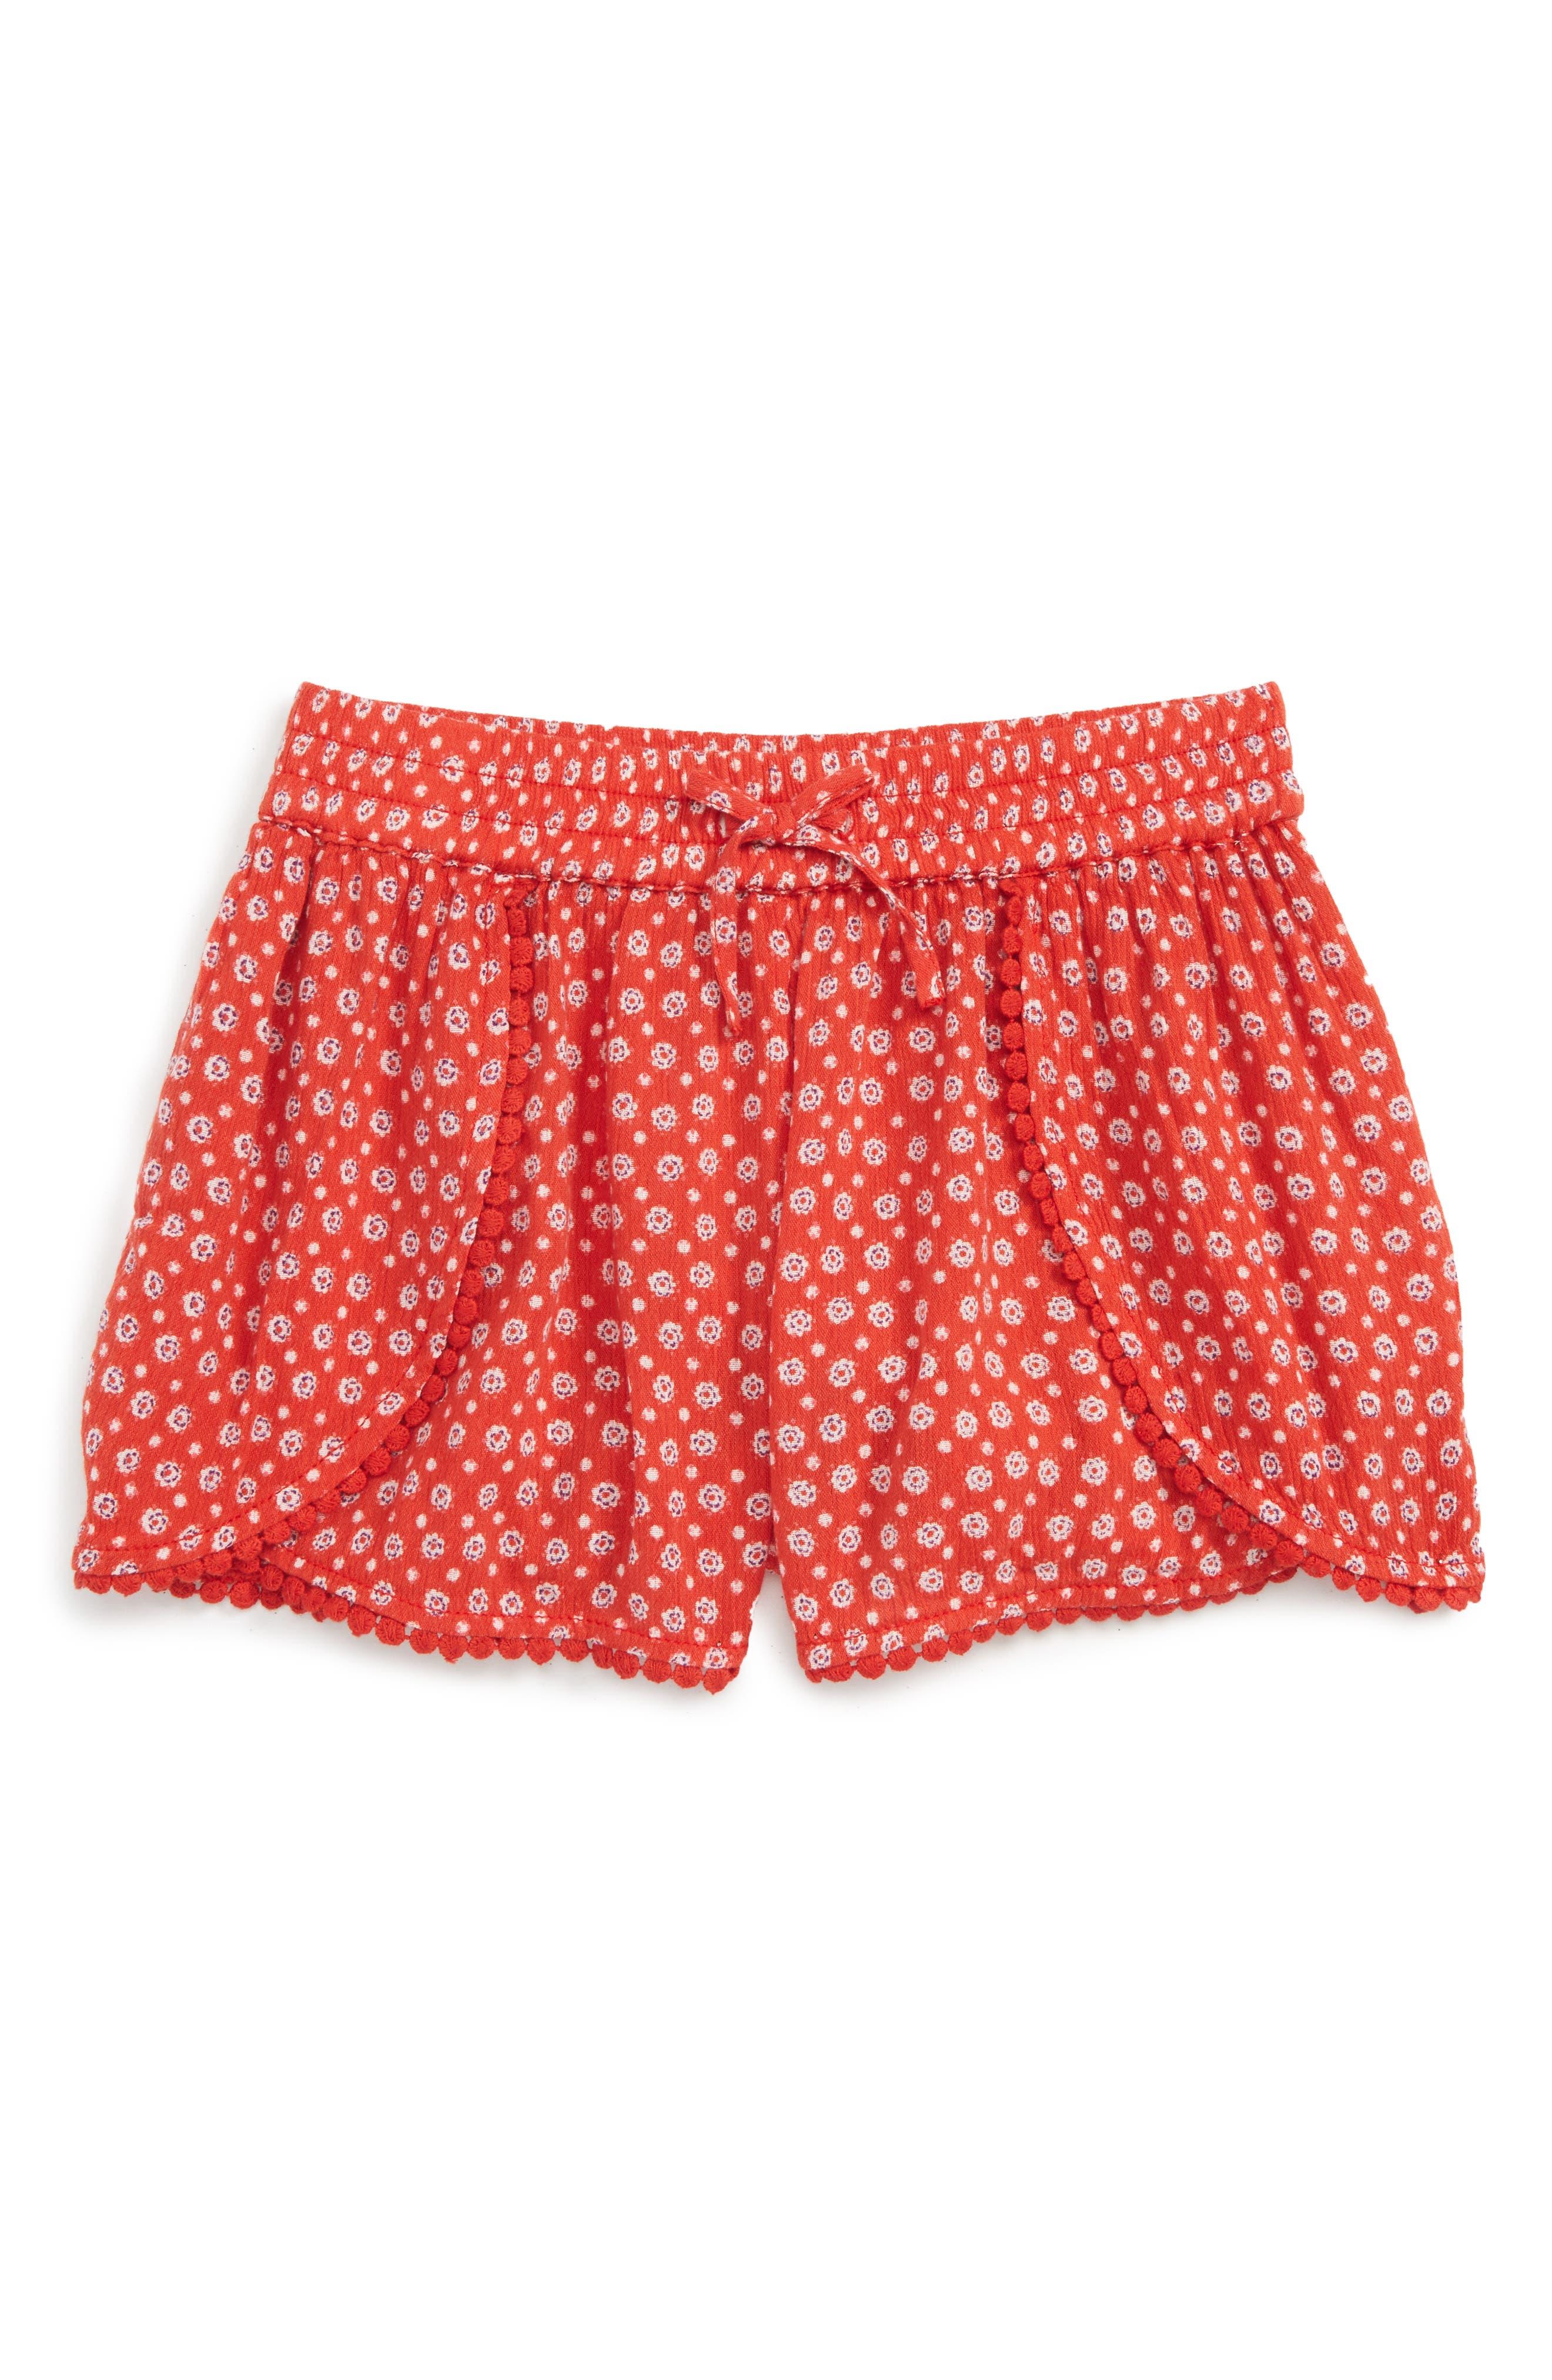 Alternate Image 1 Selected - Tucker + Tate Print Shorts (Big Girls)